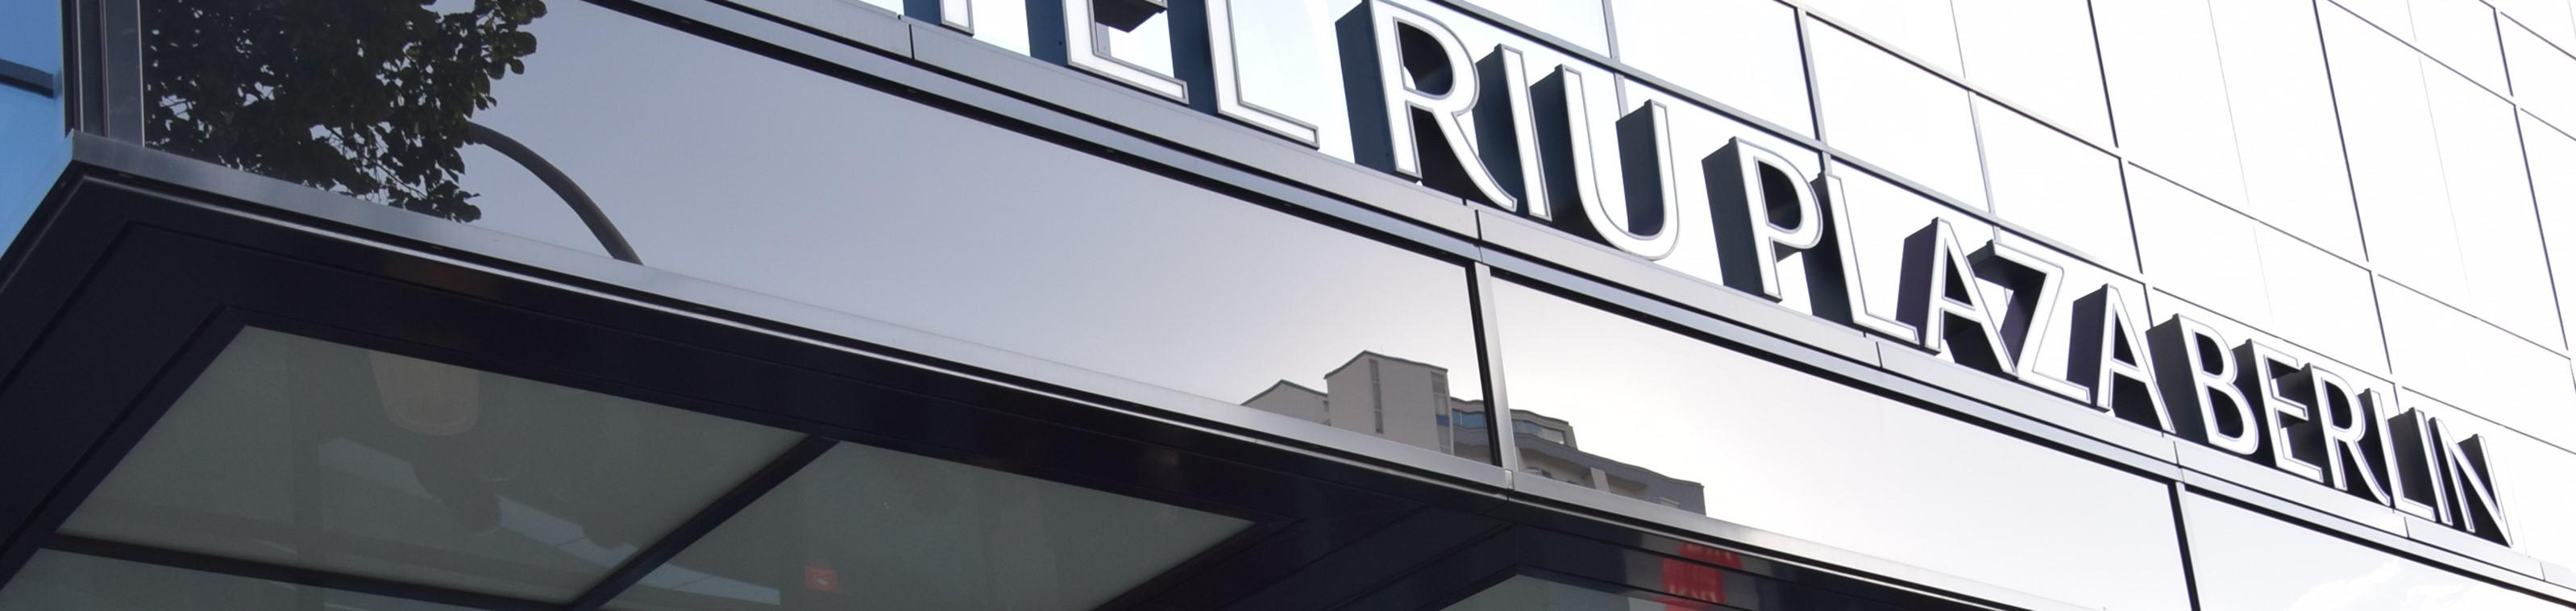 6 redenen om Hotel Riu Plaza Berlin te kiezen